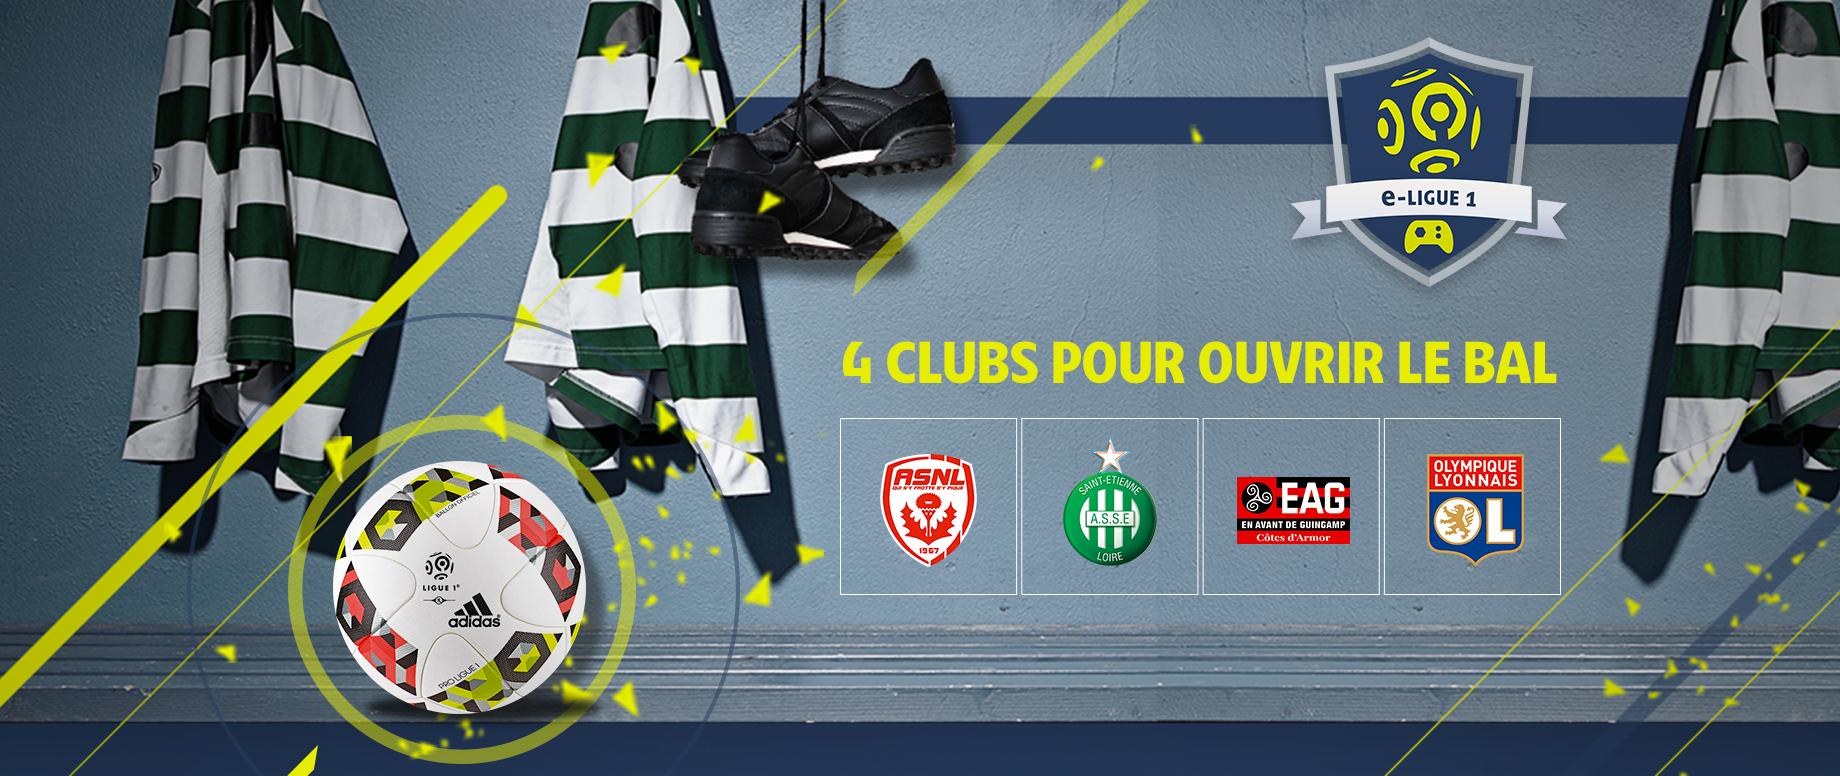 e-ligue-1-bein-sports-webedia-lfp